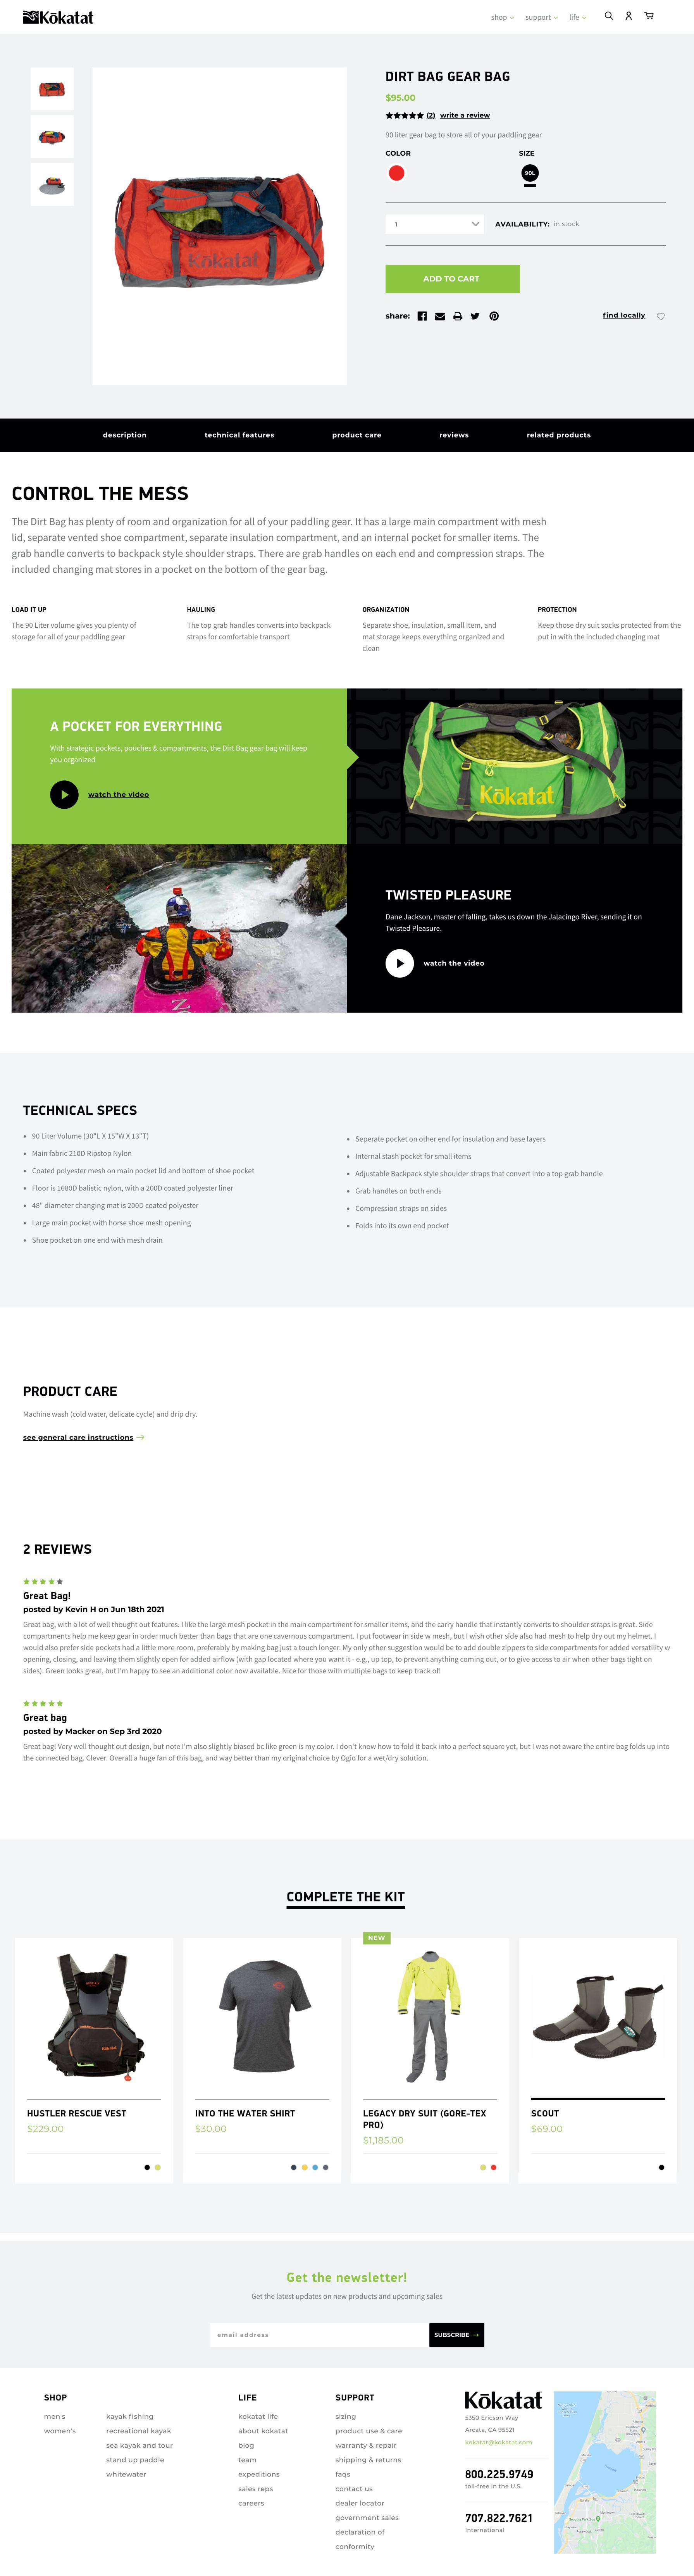 [ODINT] CASE STUDY IMAGES_ kokatat_tier 3 image 2 (second option)@3x